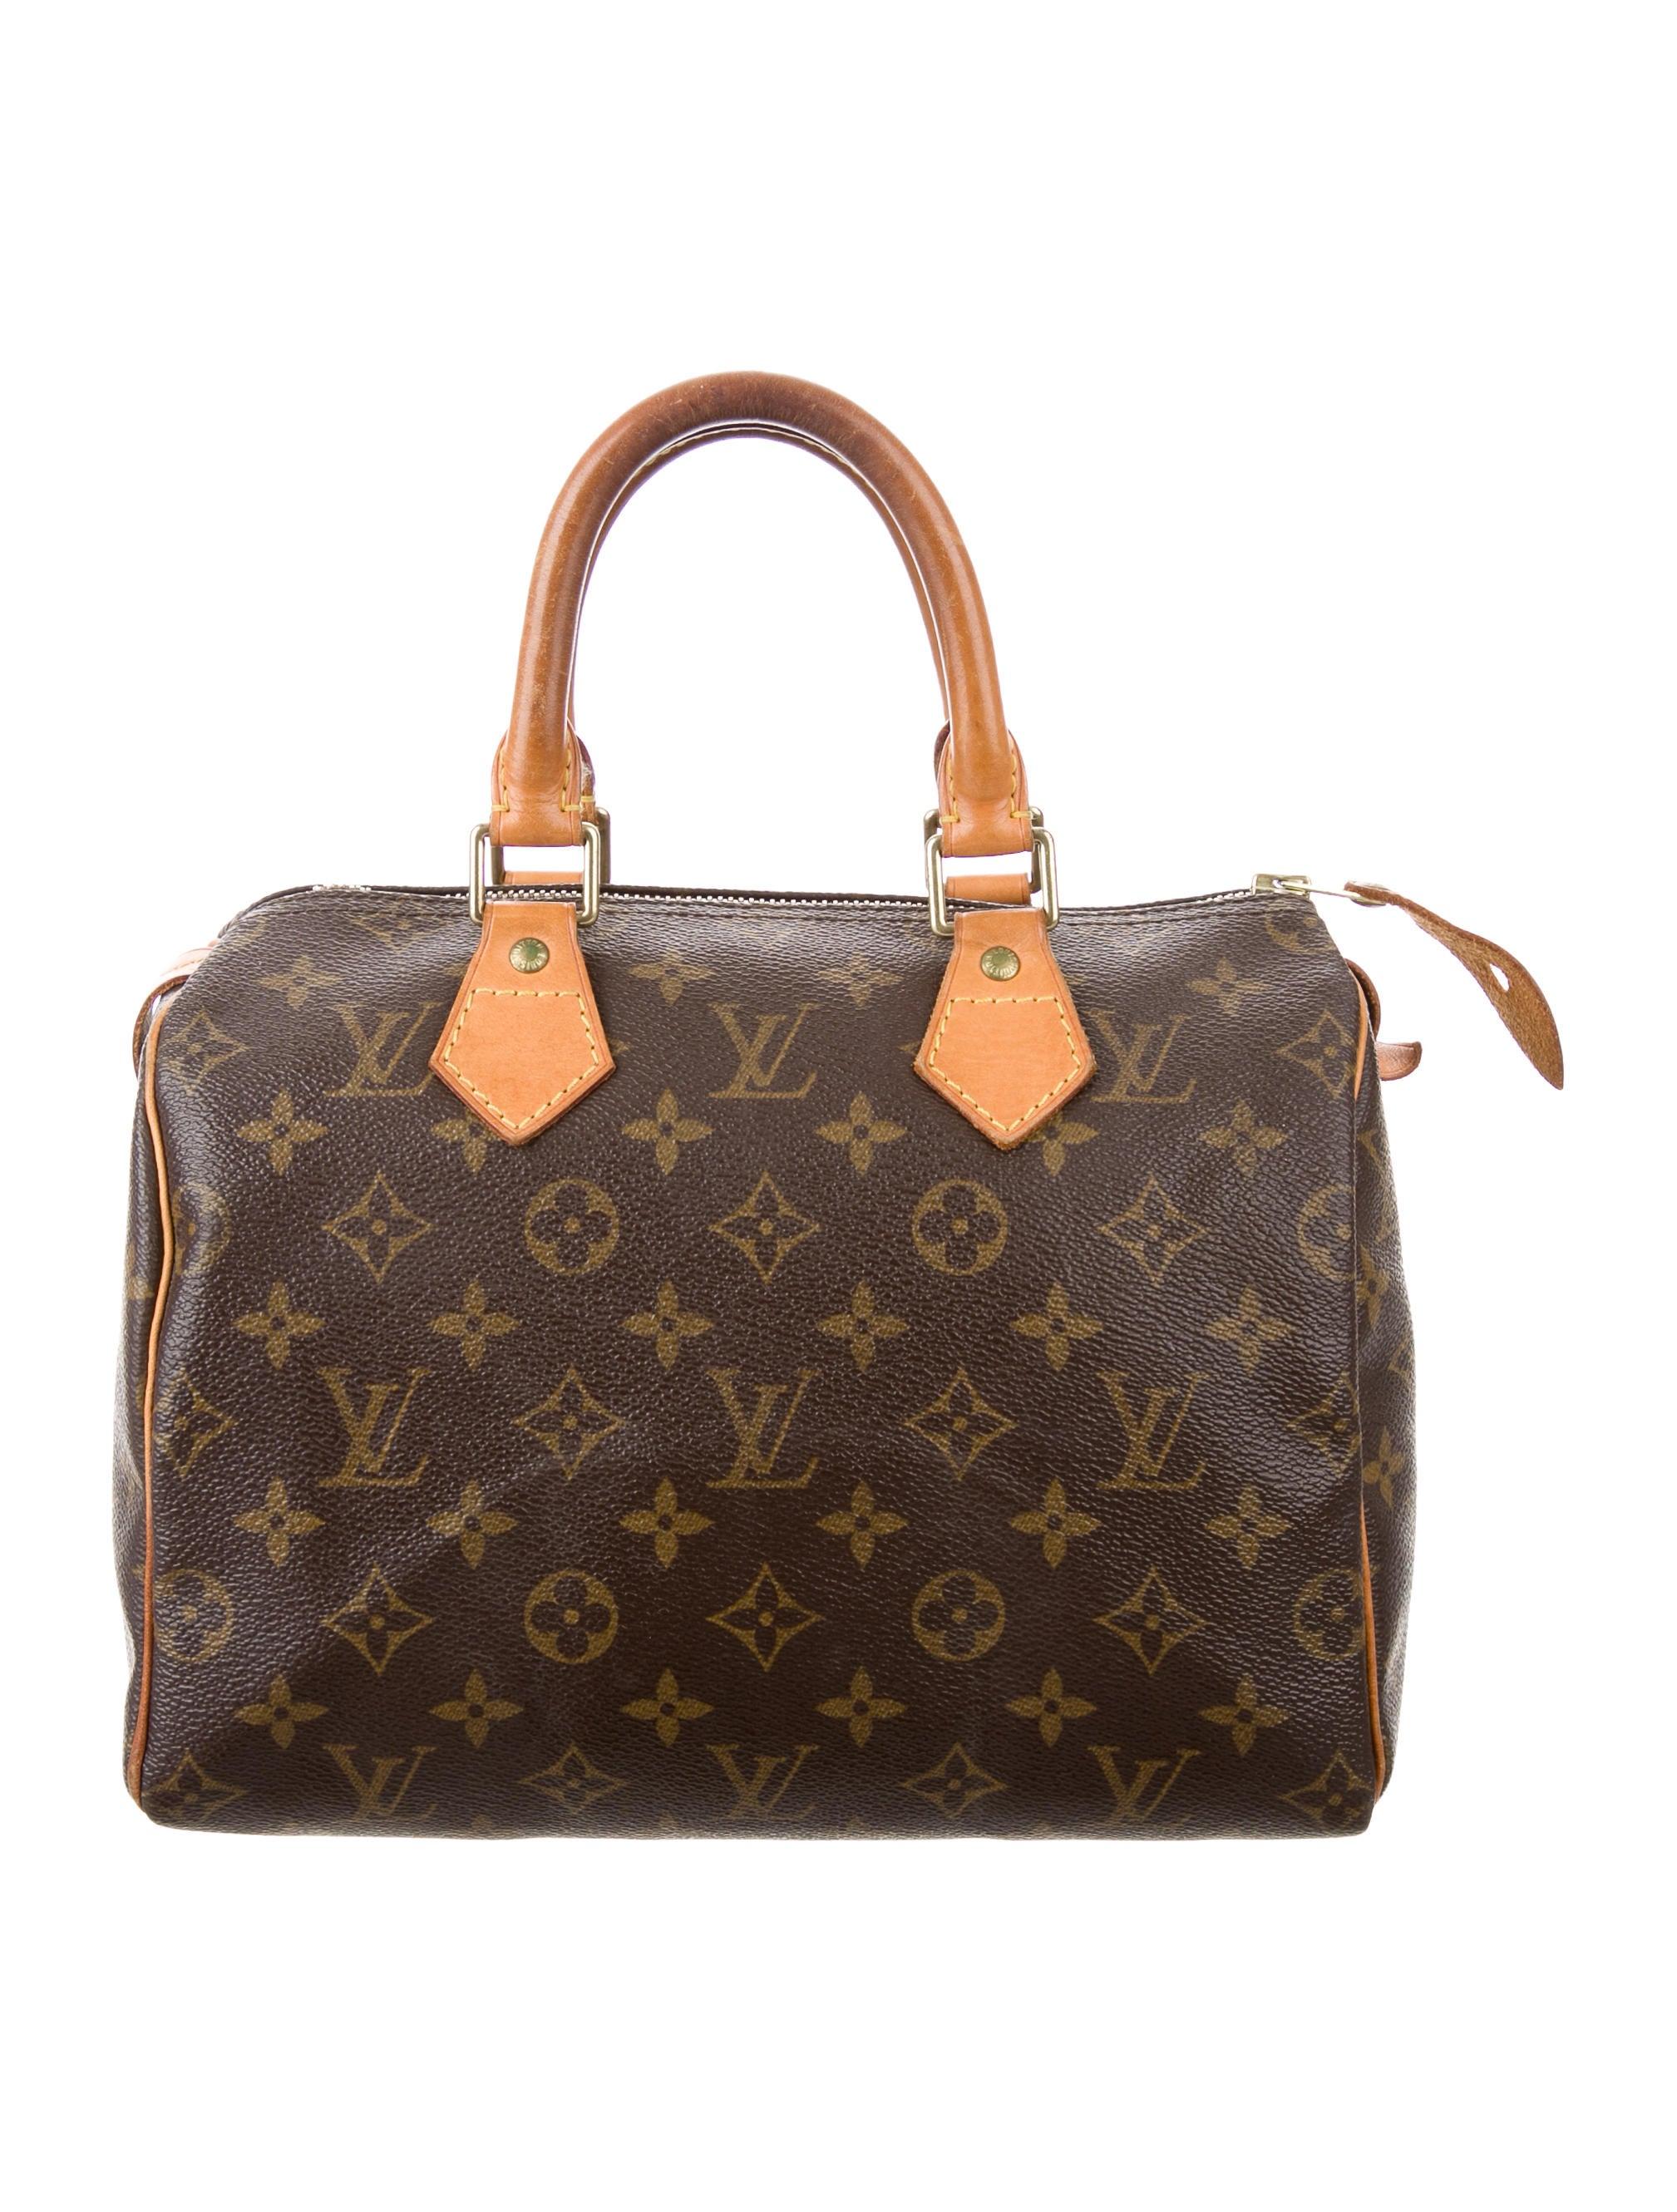 louis vuitton monogram speedy 25 handbags lou121245. Black Bedroom Furniture Sets. Home Design Ideas